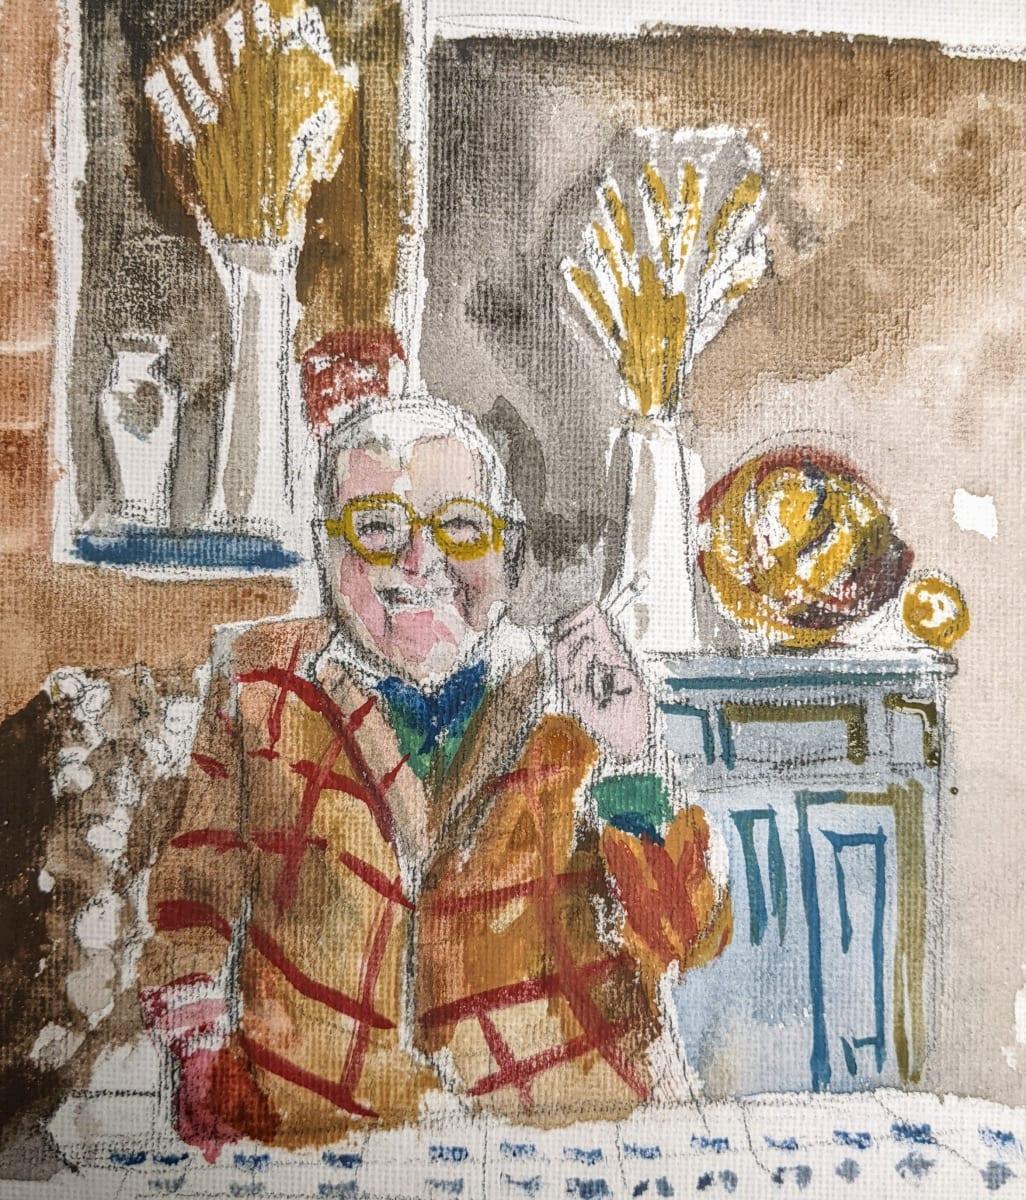 David Hockney by Maria Kelebeev